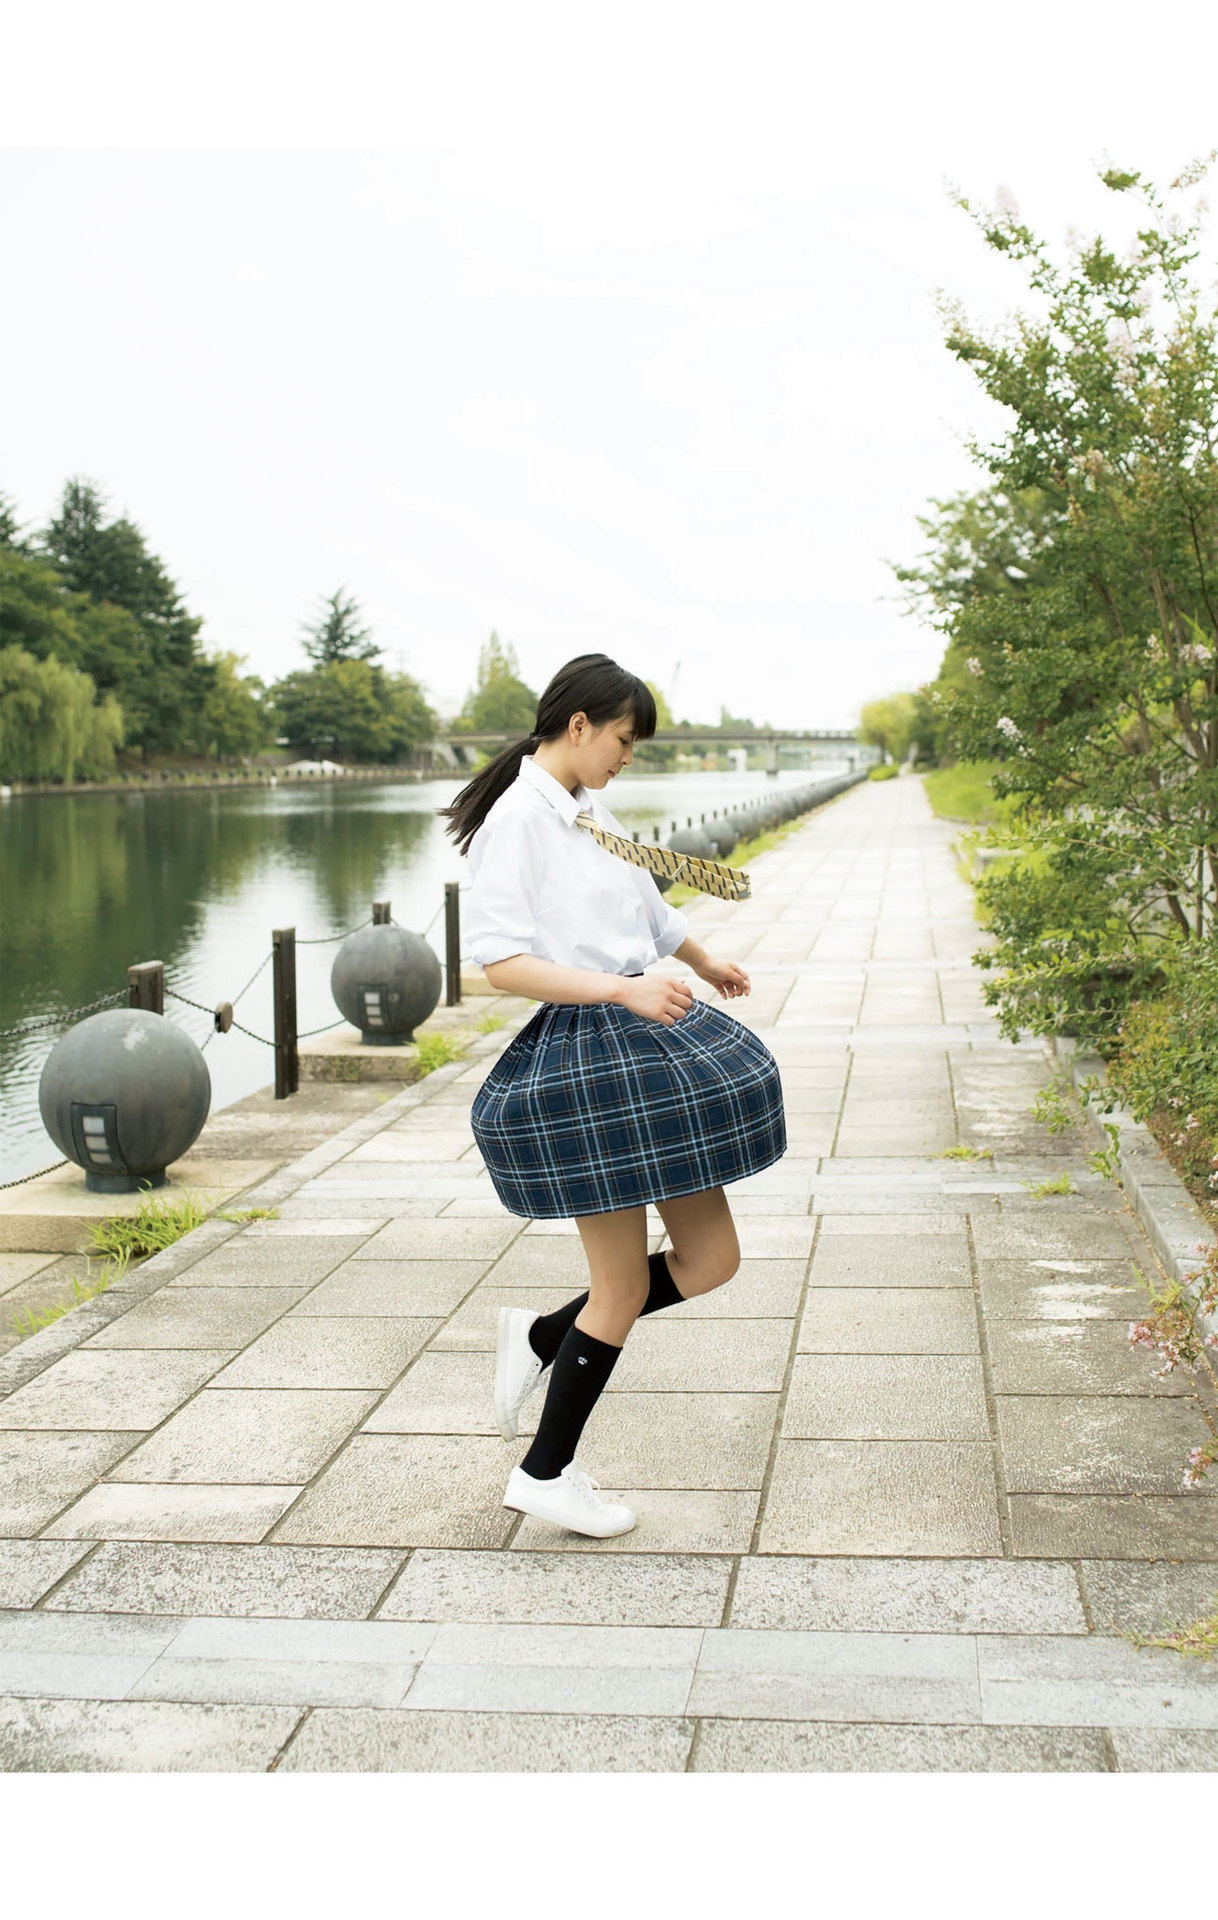 Summer Vacation Uniform After School Youth Bikini035